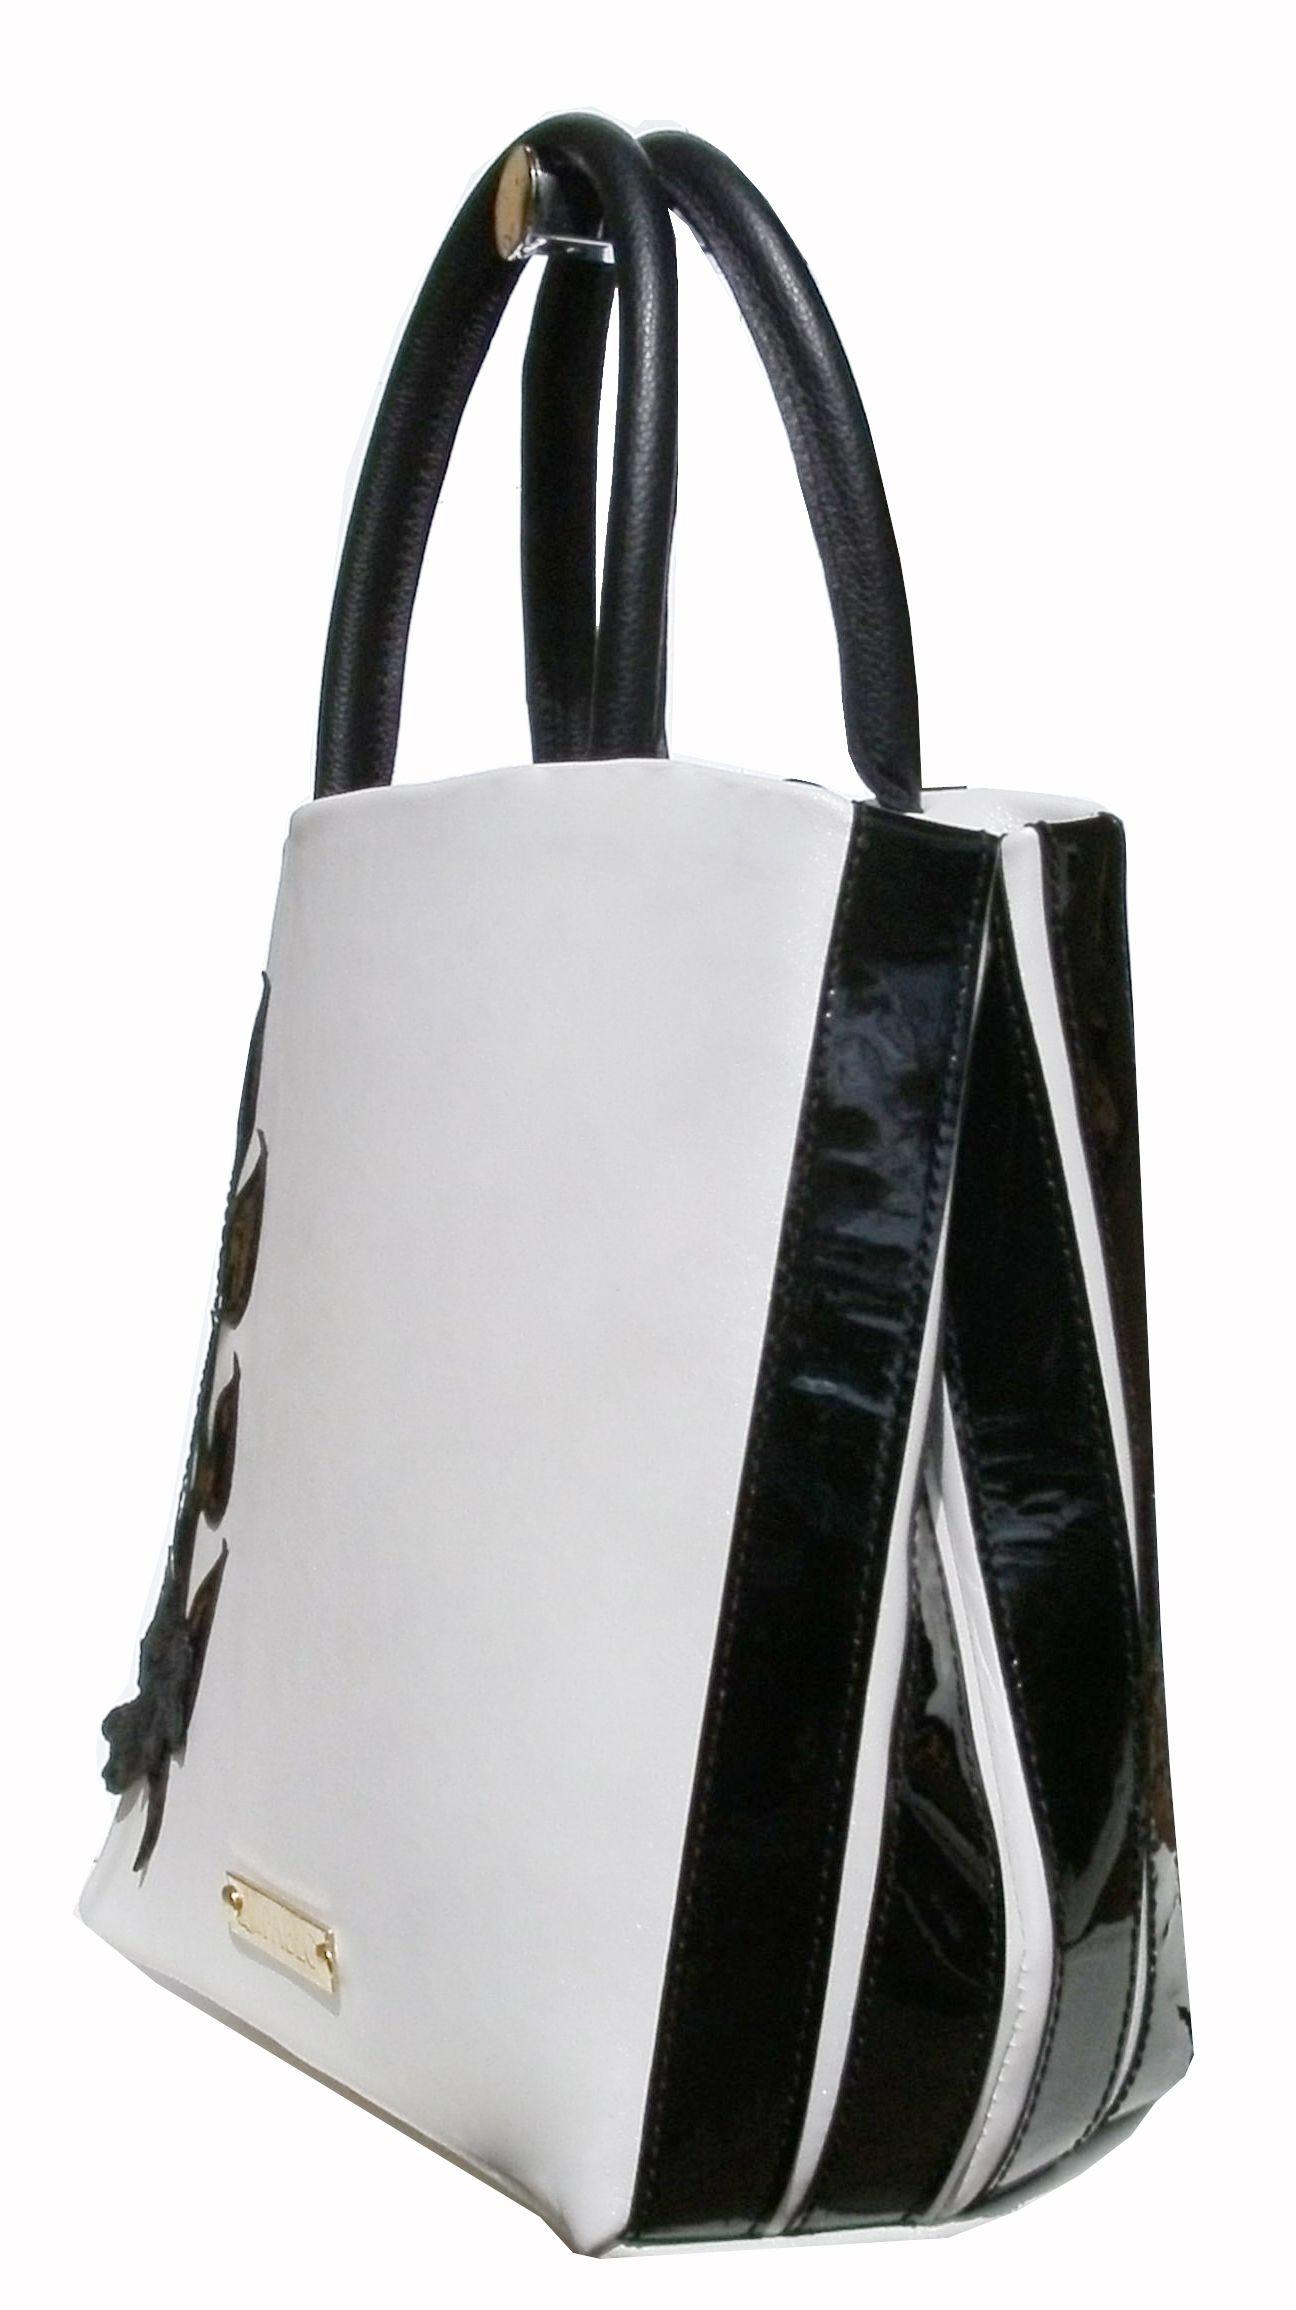 Las Pablo Handbags Ss 14